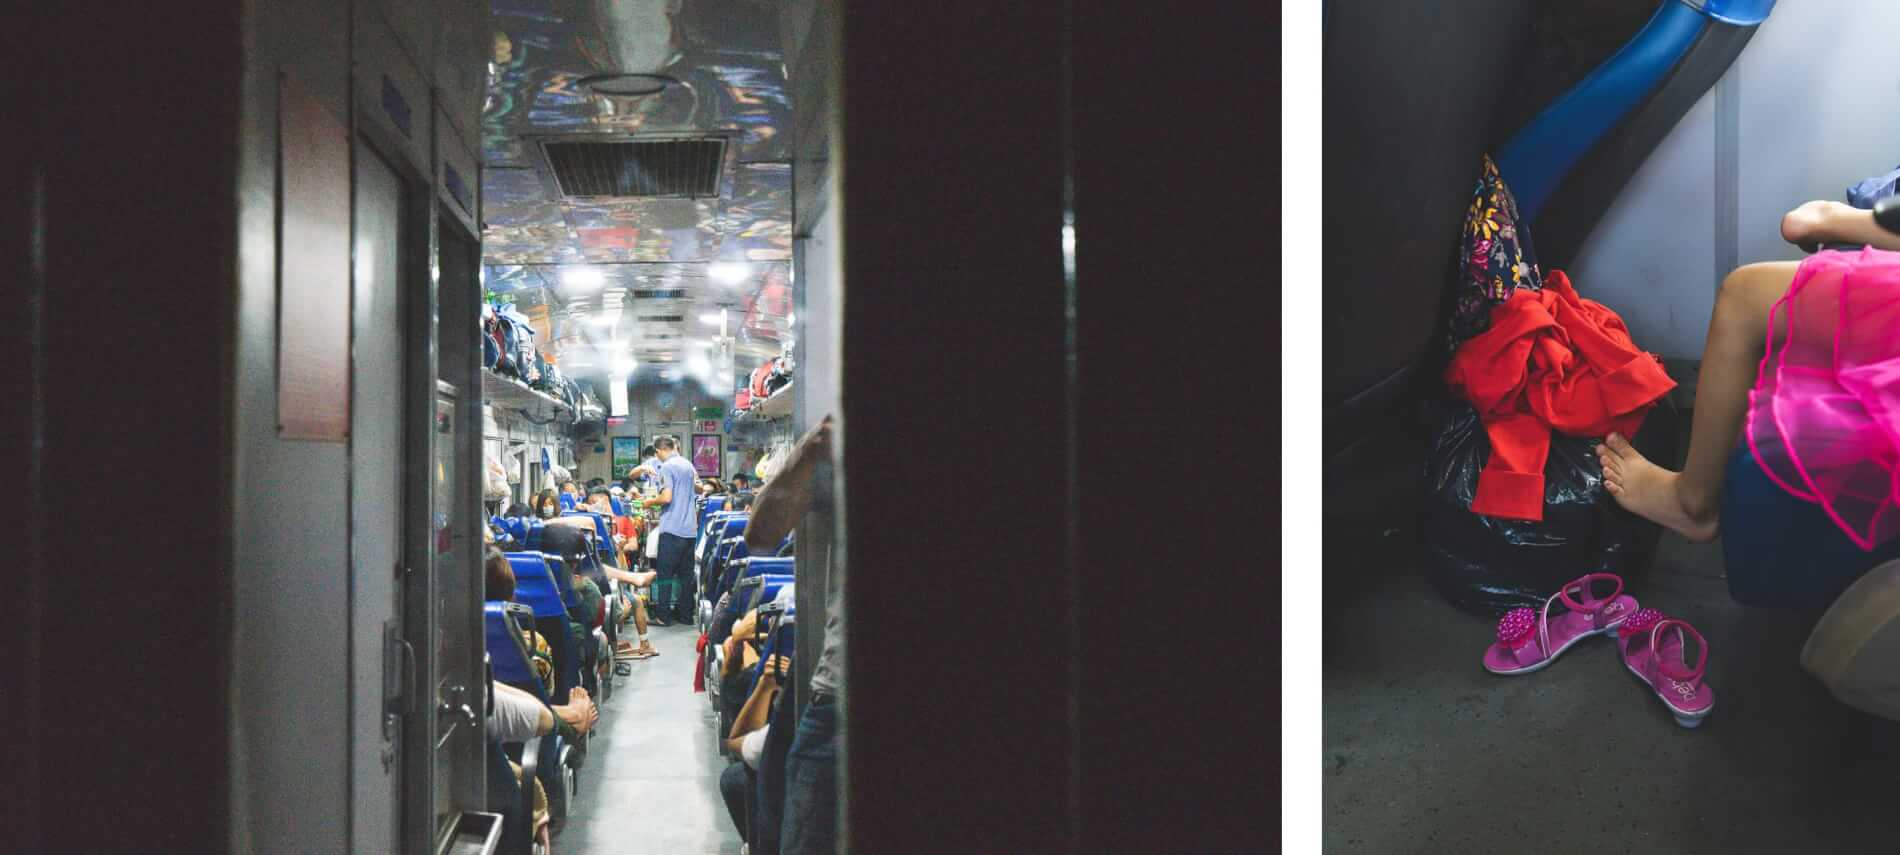 Train from Danang to Hue - Hue's abandoned water park